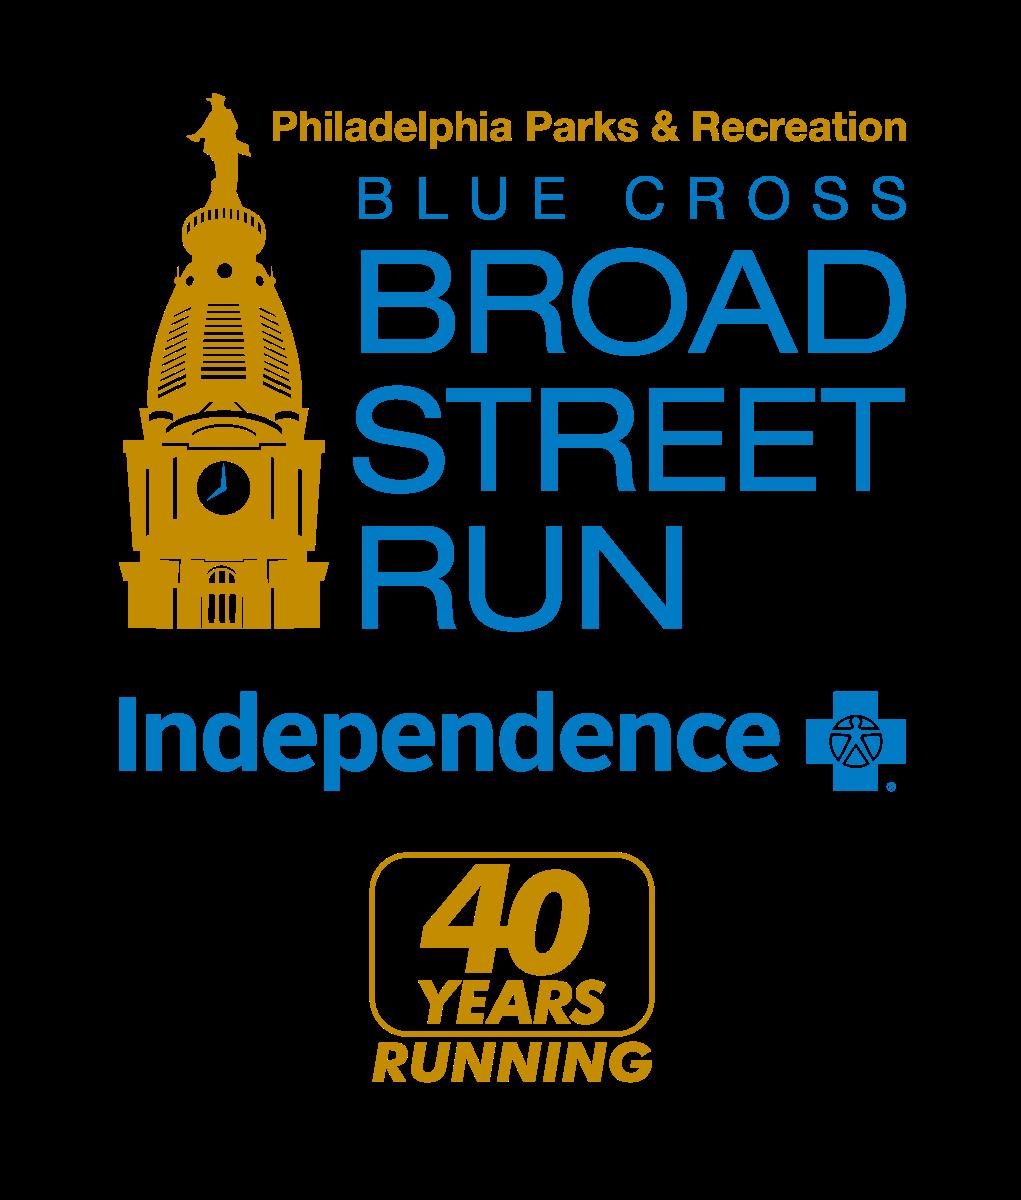 The new logo of the Blue Cross Broad Street Run.